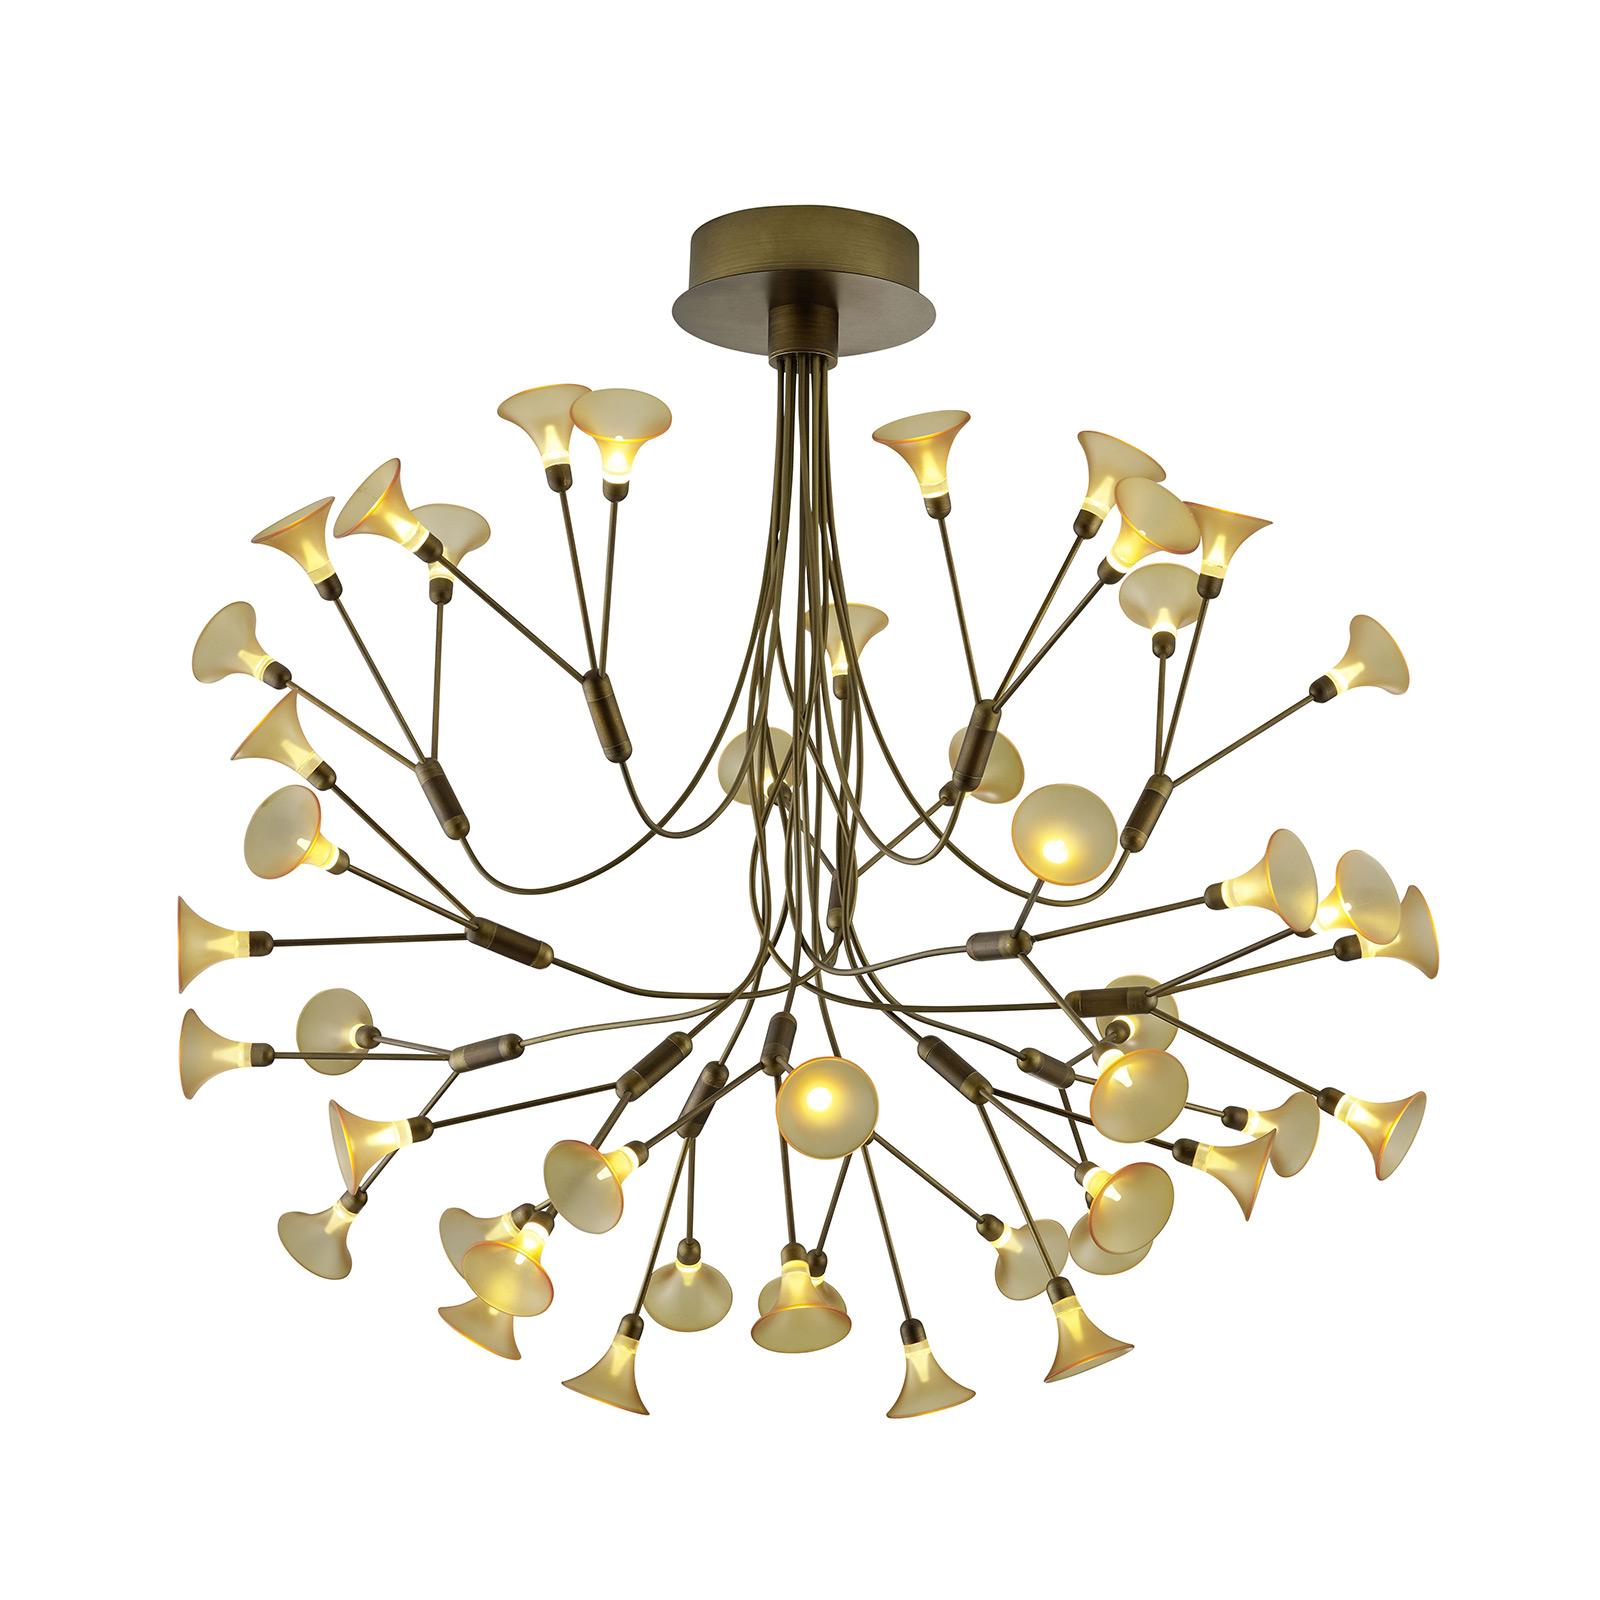 B-Leuchten Fleur lampa wisząca LED, stary mosiądz